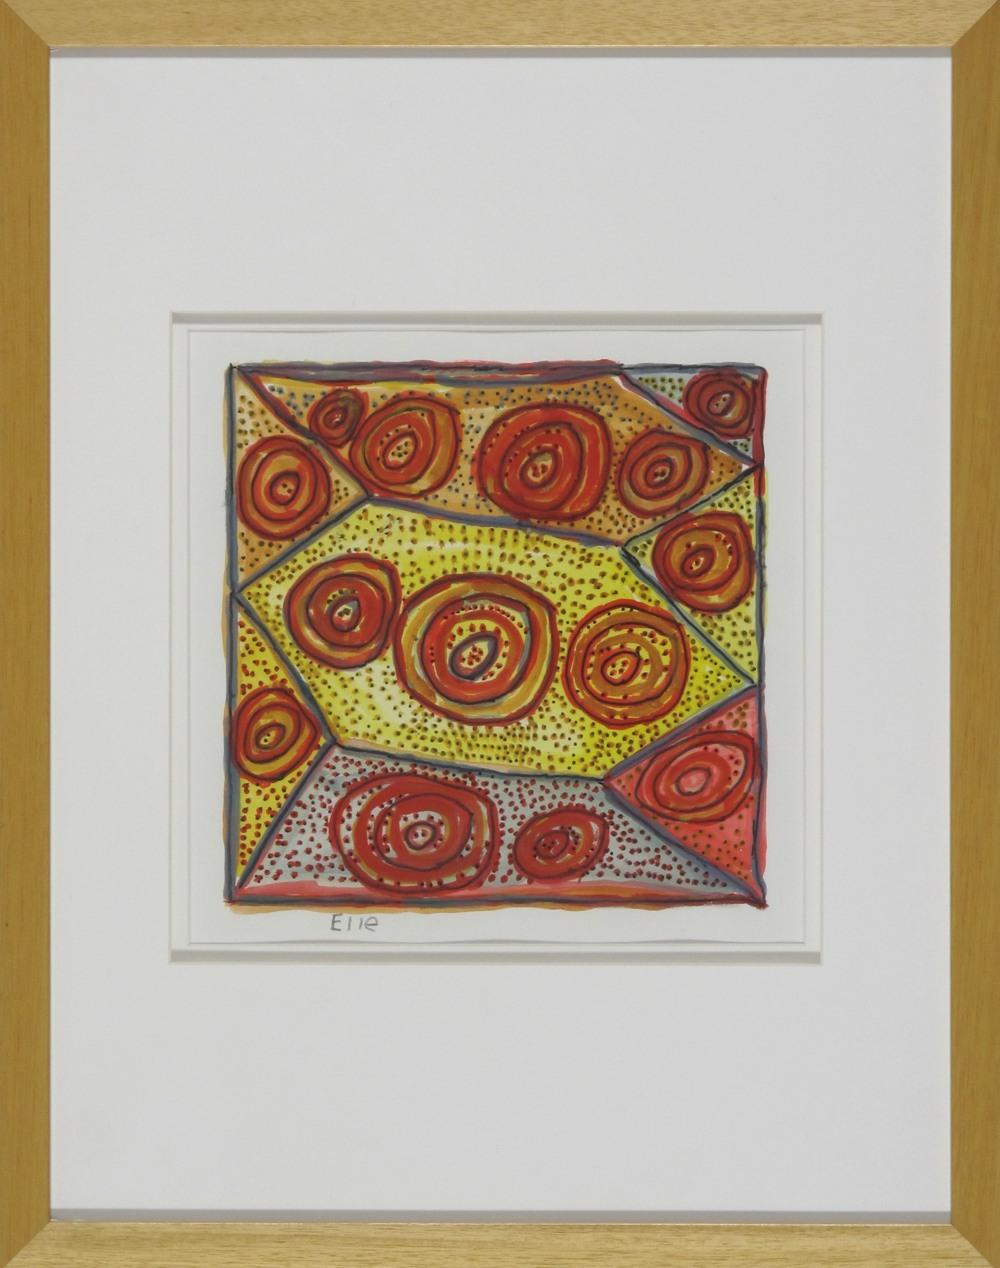 #12980. Estell Munkanome. Jilamara I. Original Painting on Paper 47cm x 37cm $380 $228